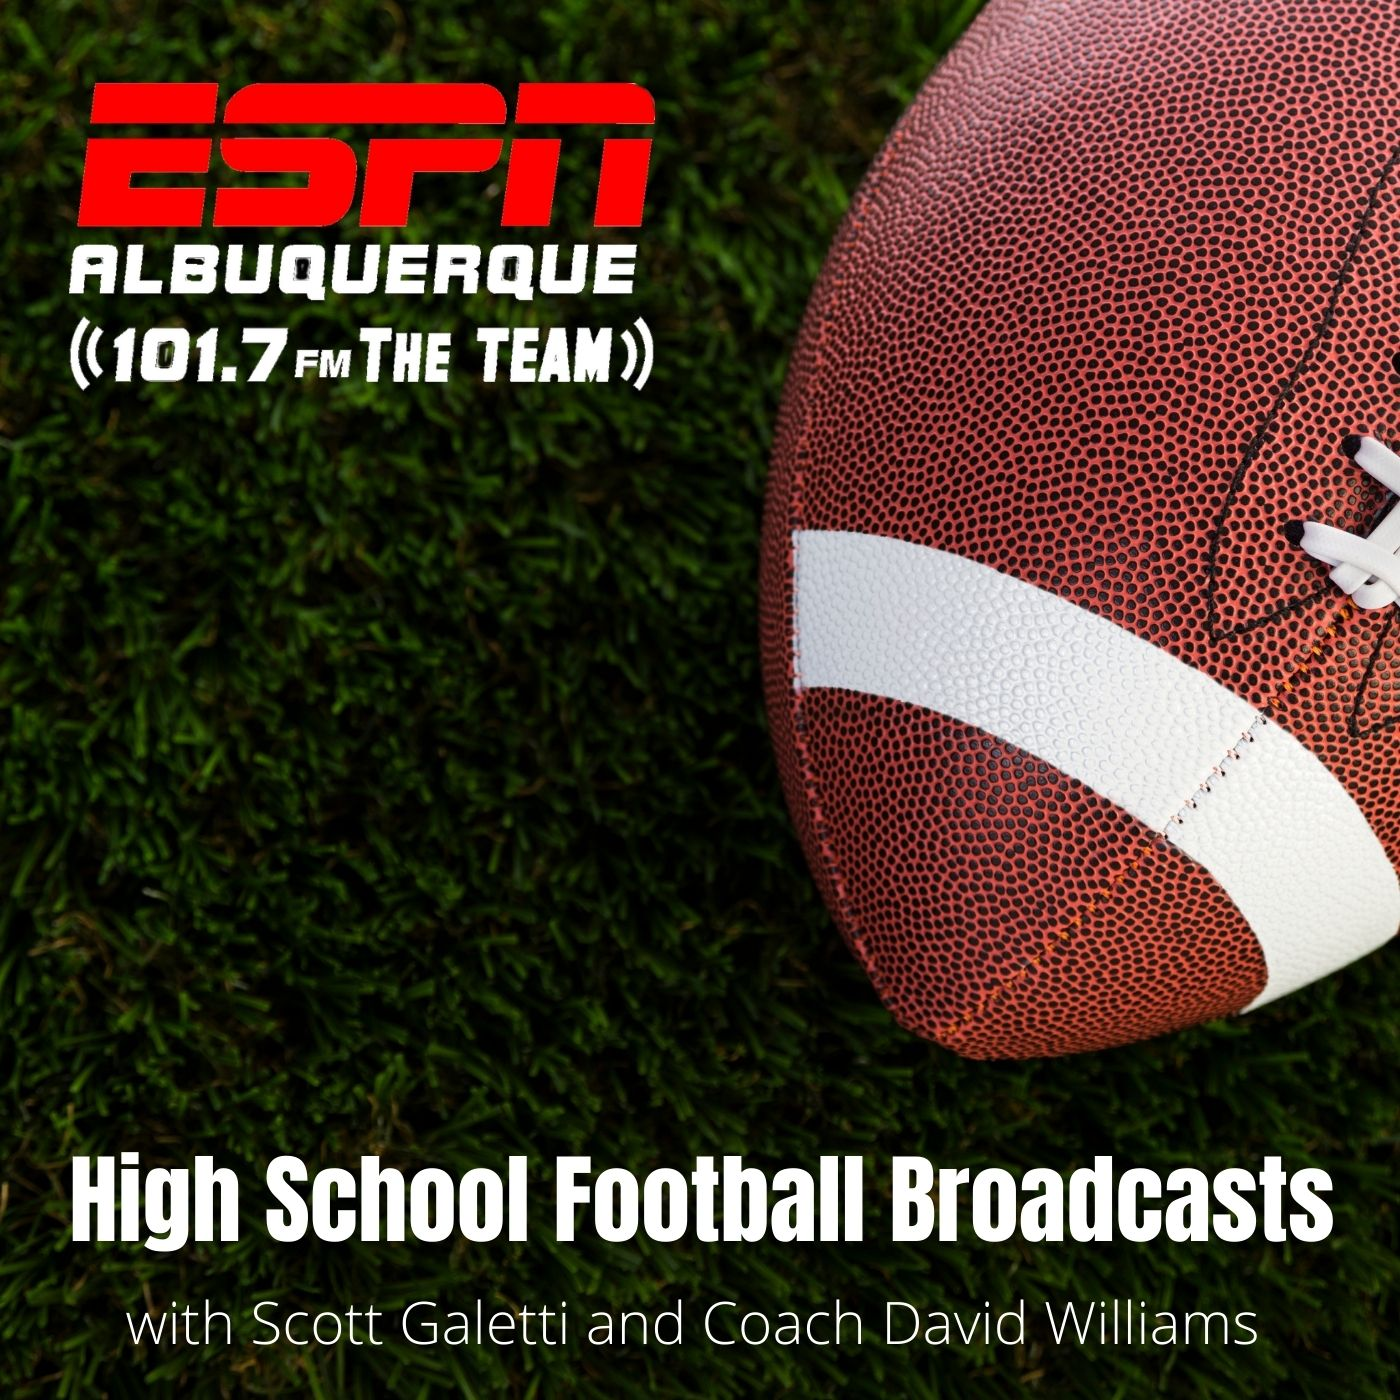 ESPN Radio 101.7 The TEAM High School Football Broadcasts